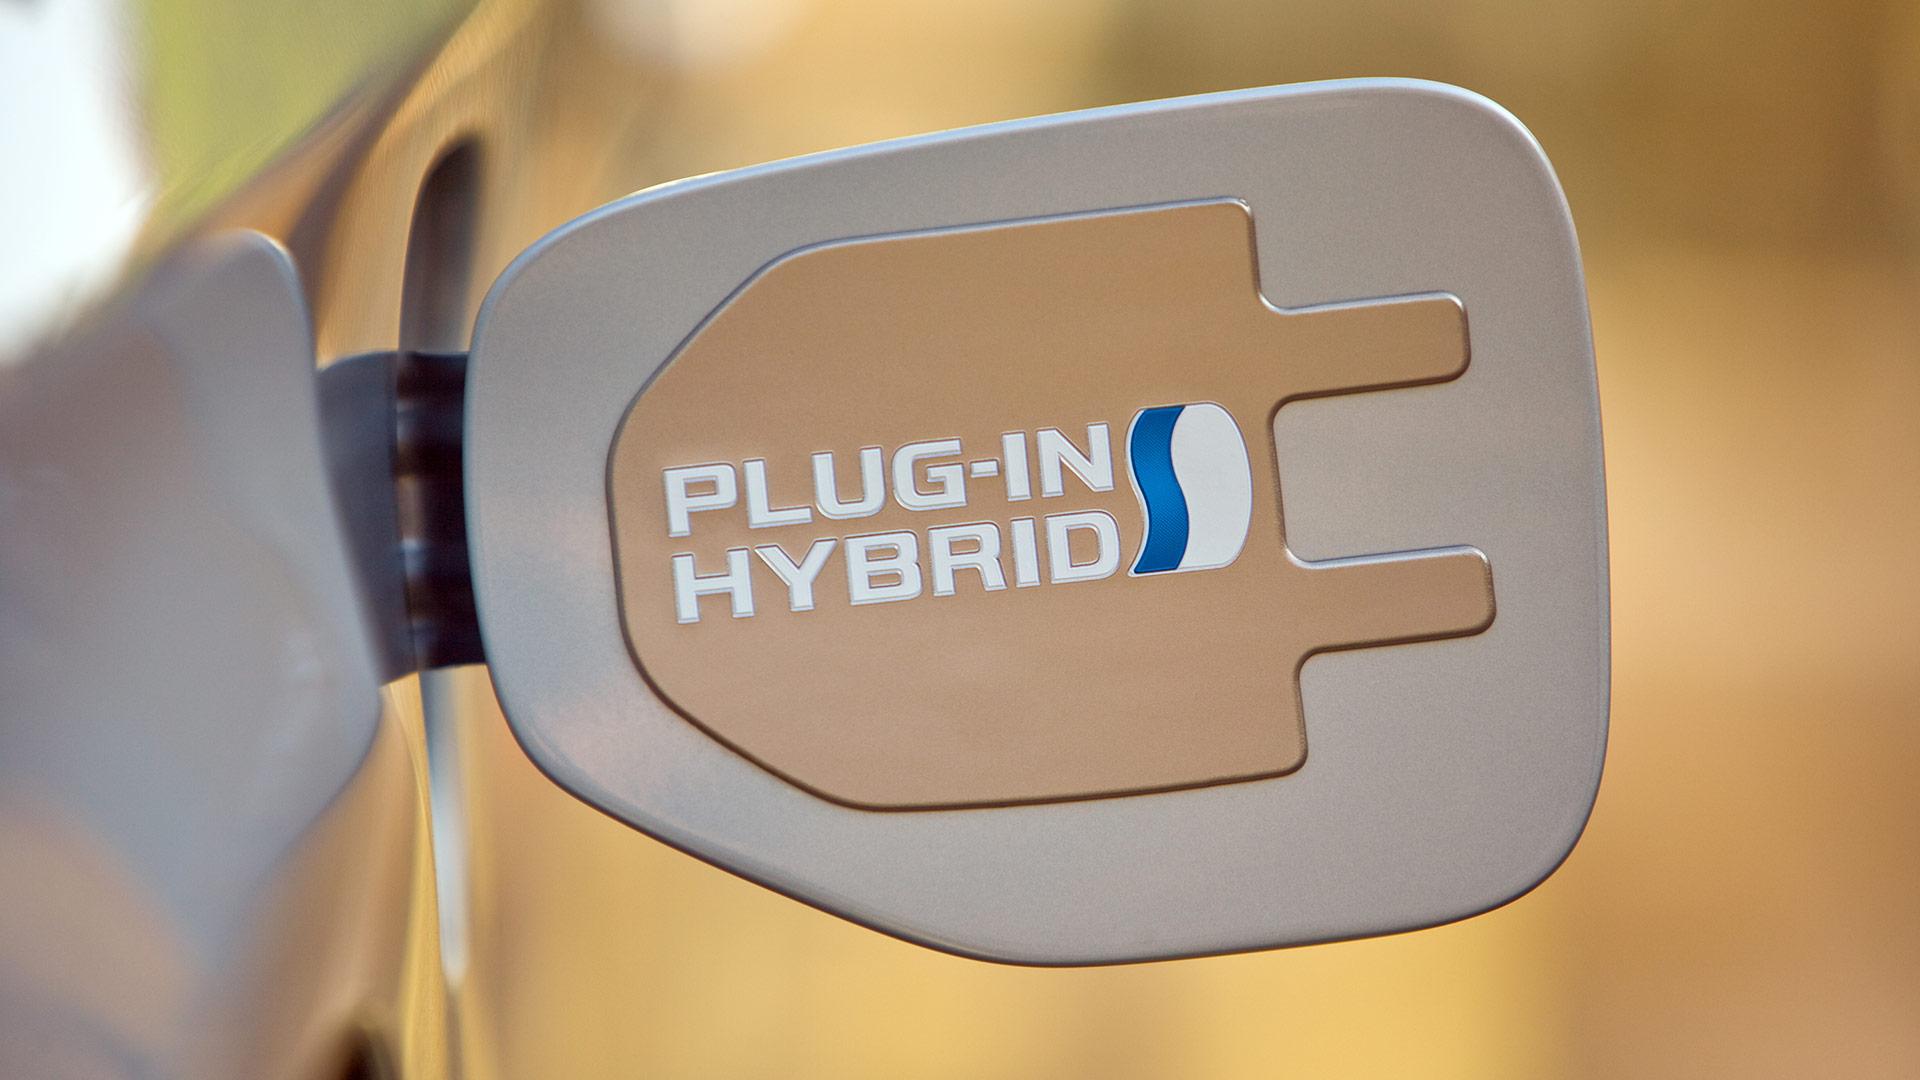 Hybrid Catalytic Converter Thefts